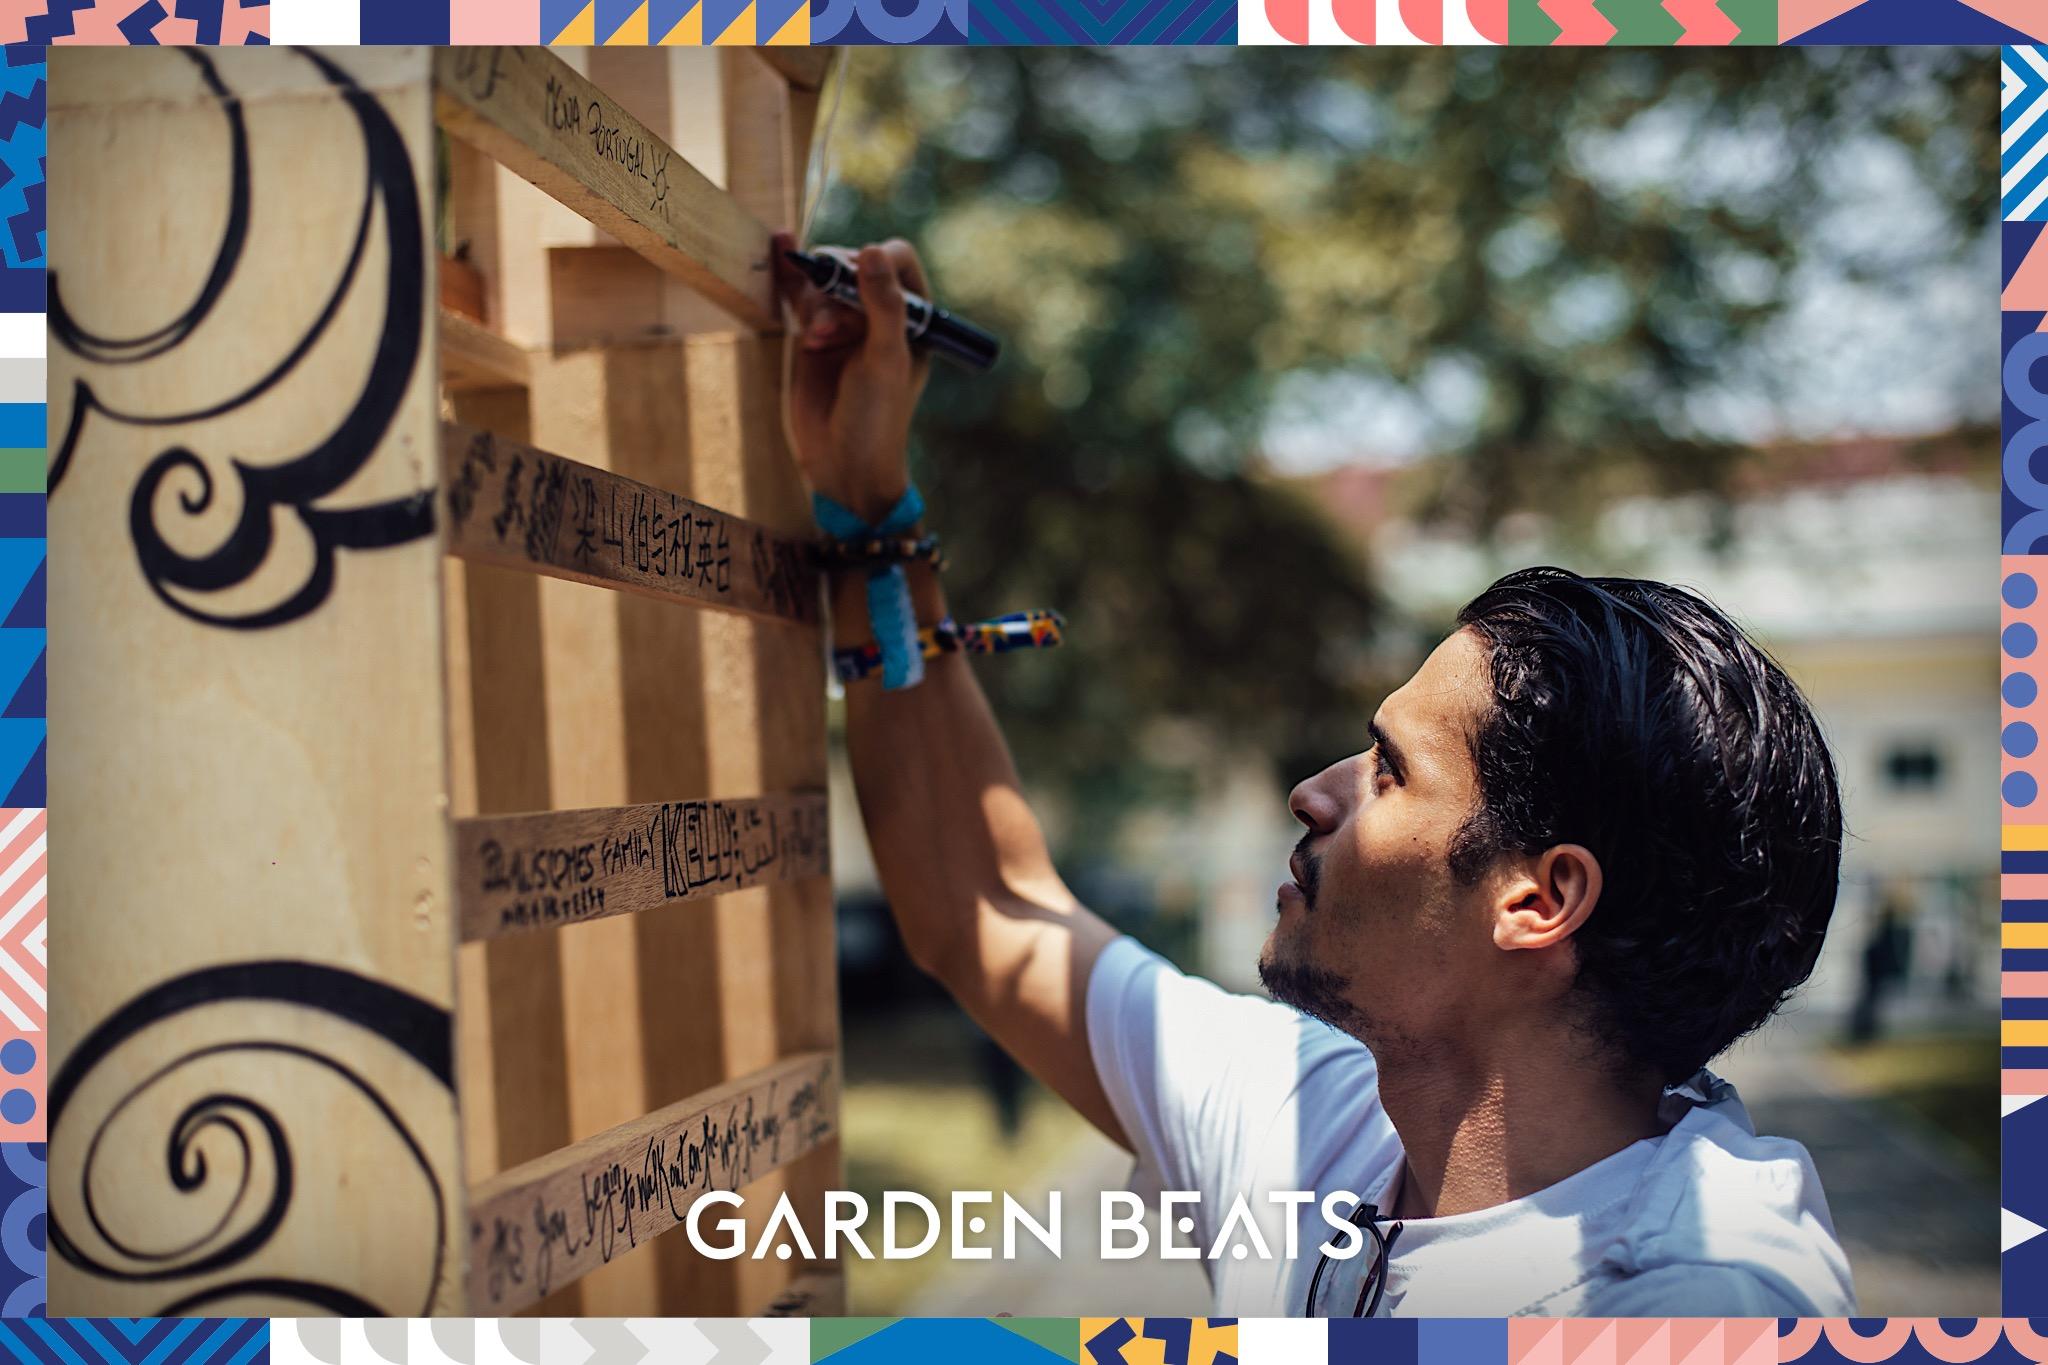 18032017_GardenBeats_Colossal130_WatermarkedGB.jpg